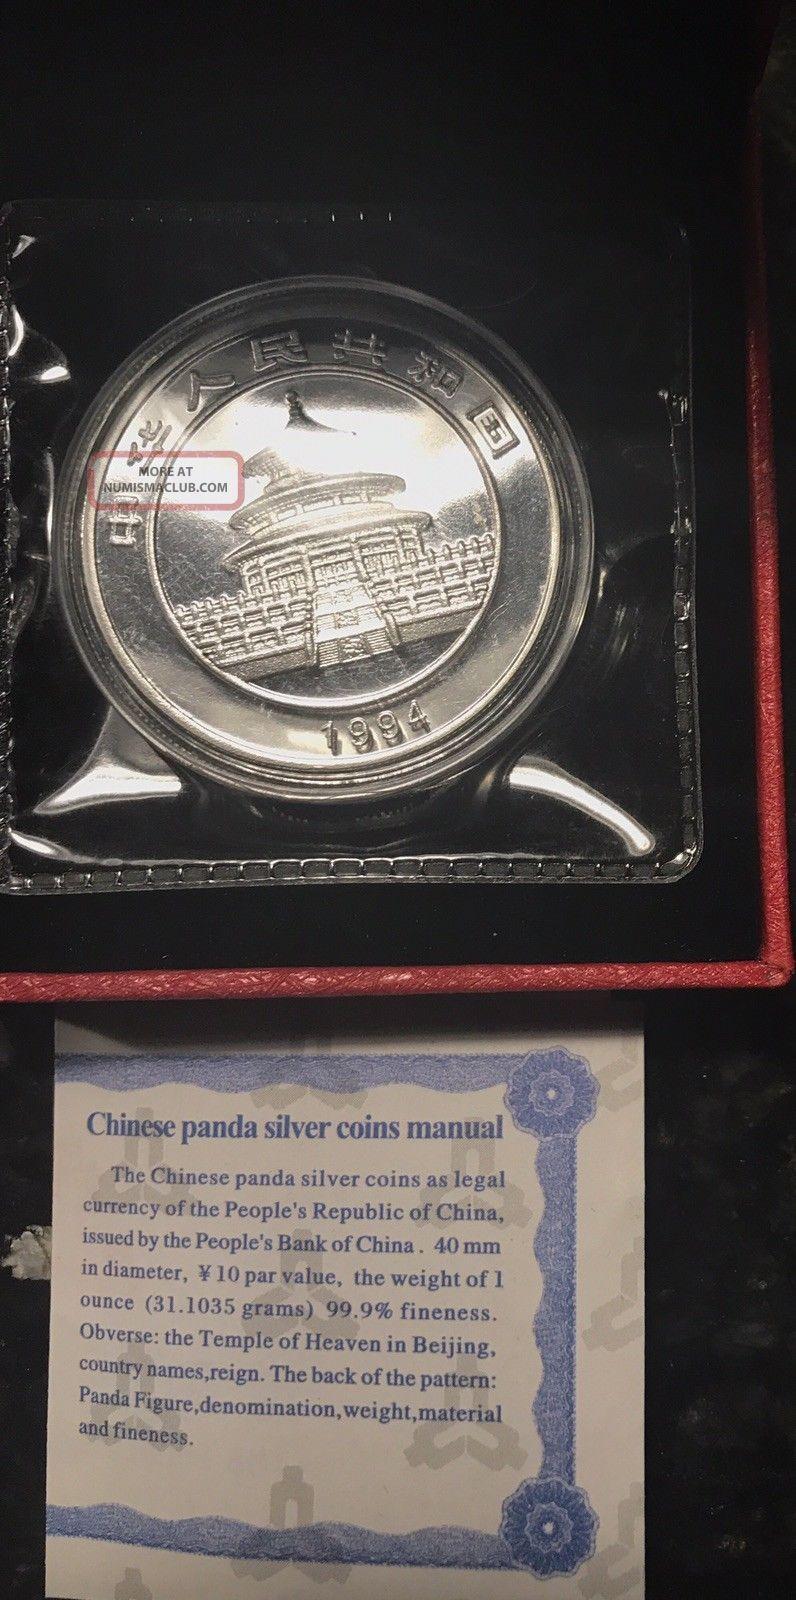 1994 China Prc 10 Yuan Panda Silver Bu Brilliant Uncirculated 1 Oz Coin.  Co China photo